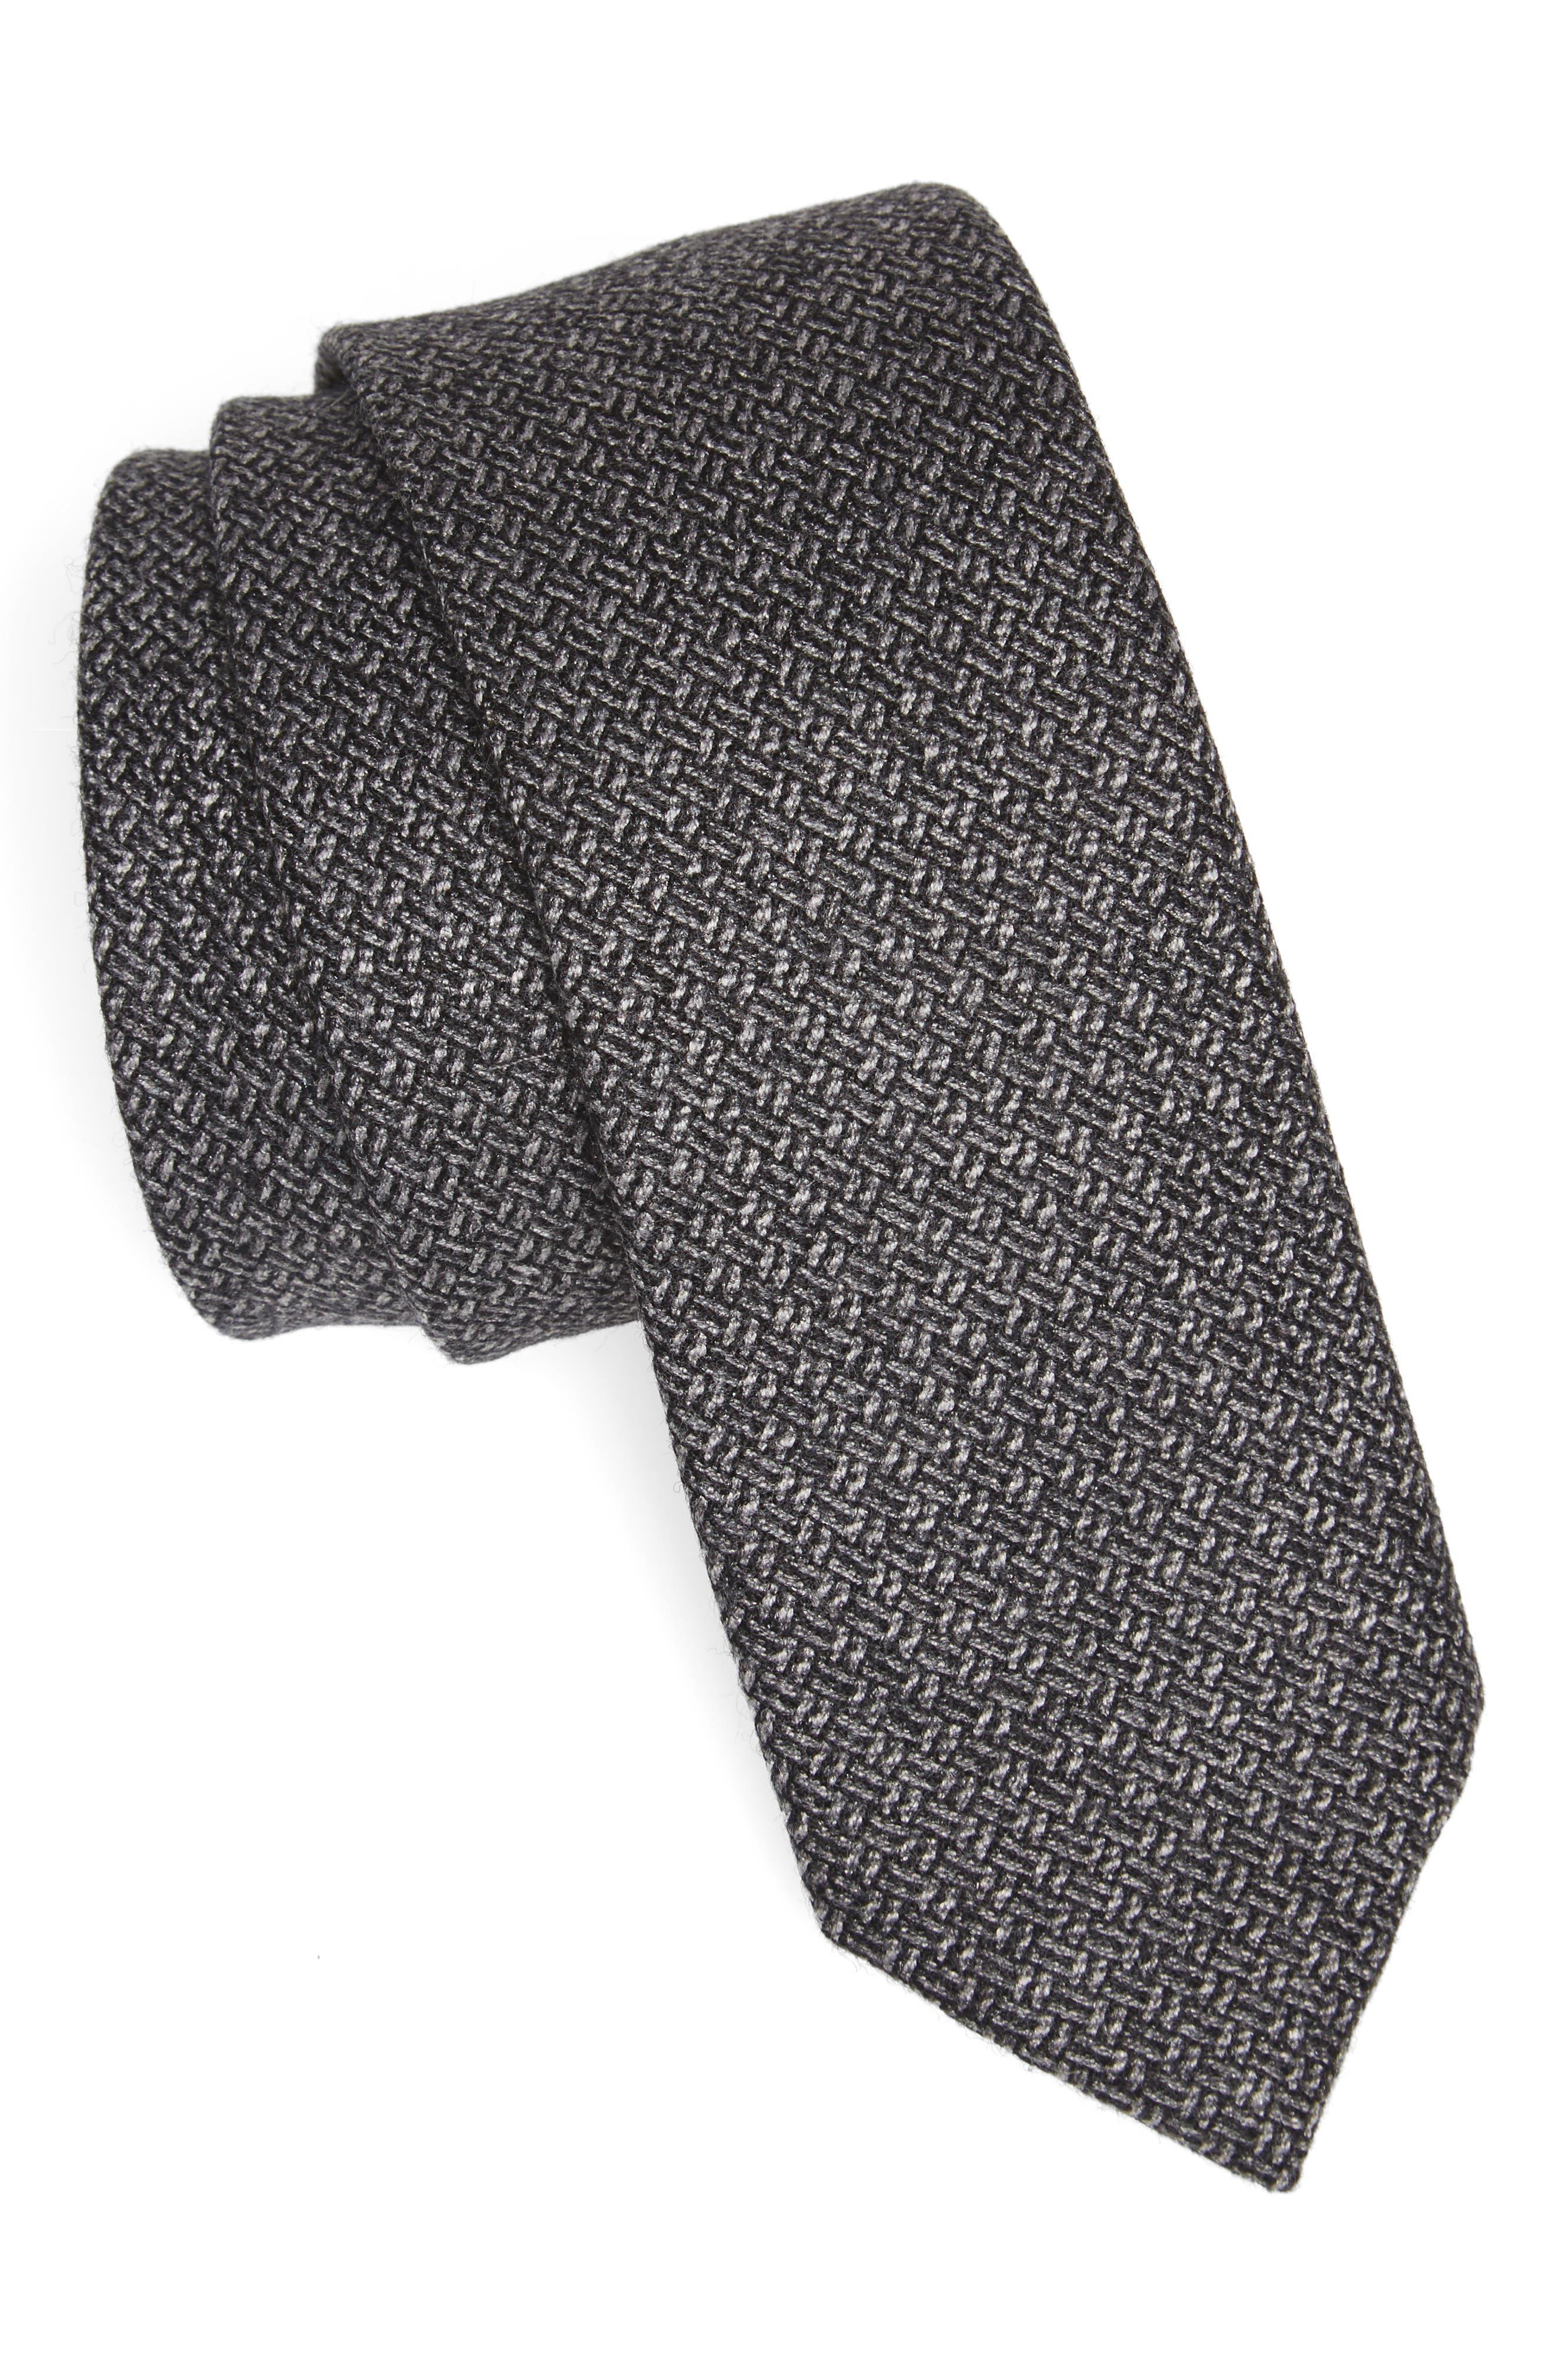 Blackboard Wool Skinny Tie,                             Main thumbnail 1, color,                             025